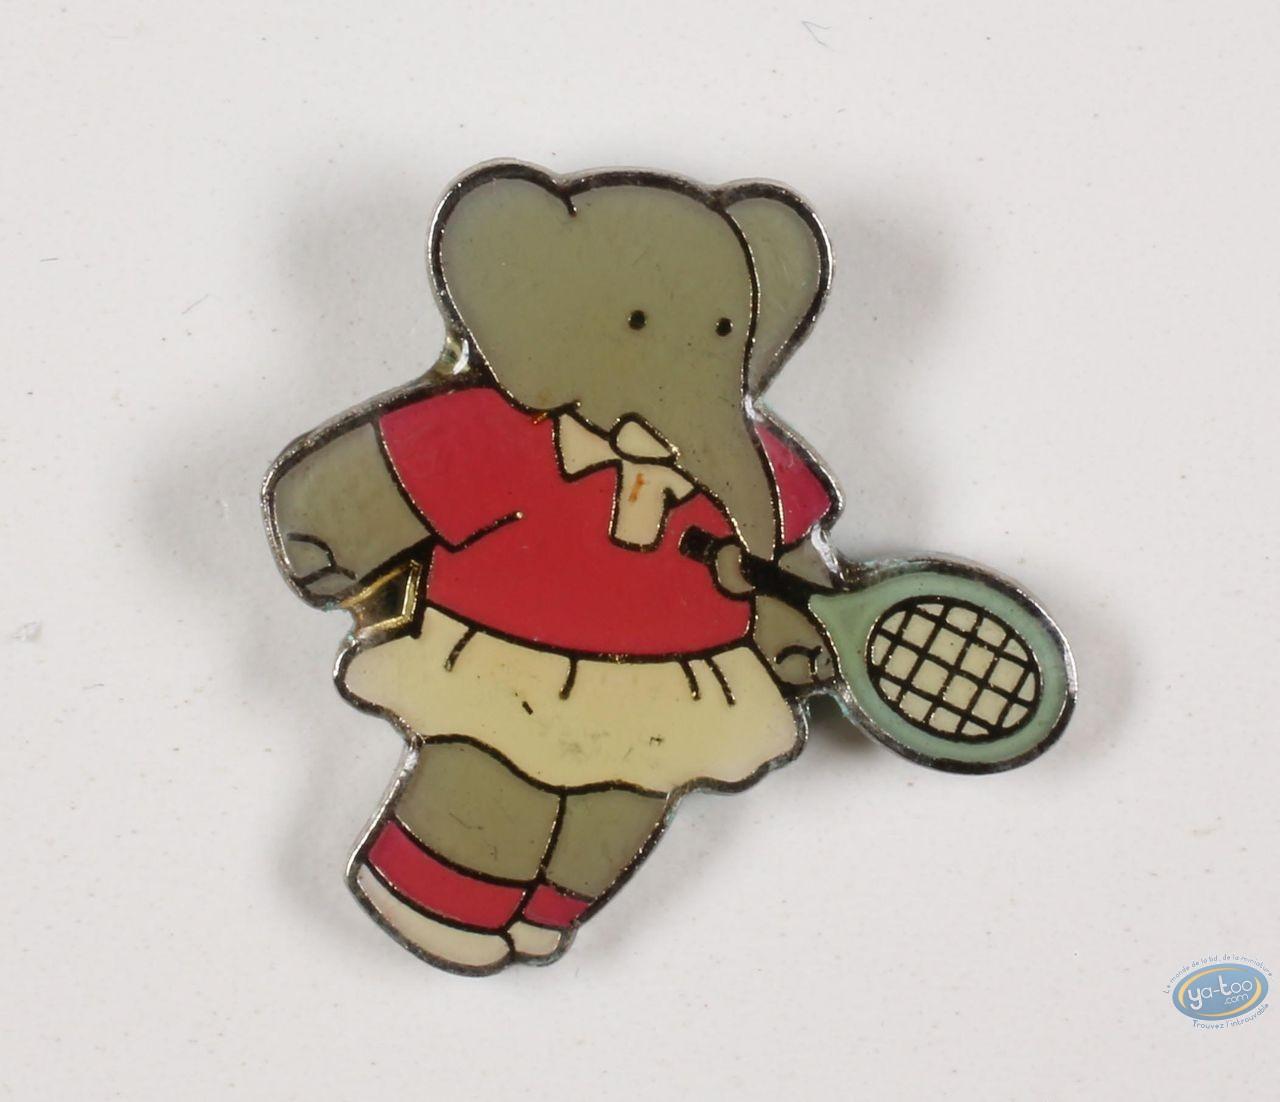 Pin's, Babar : Babar Au Tennis, Céleste intérieur Singe De Babar